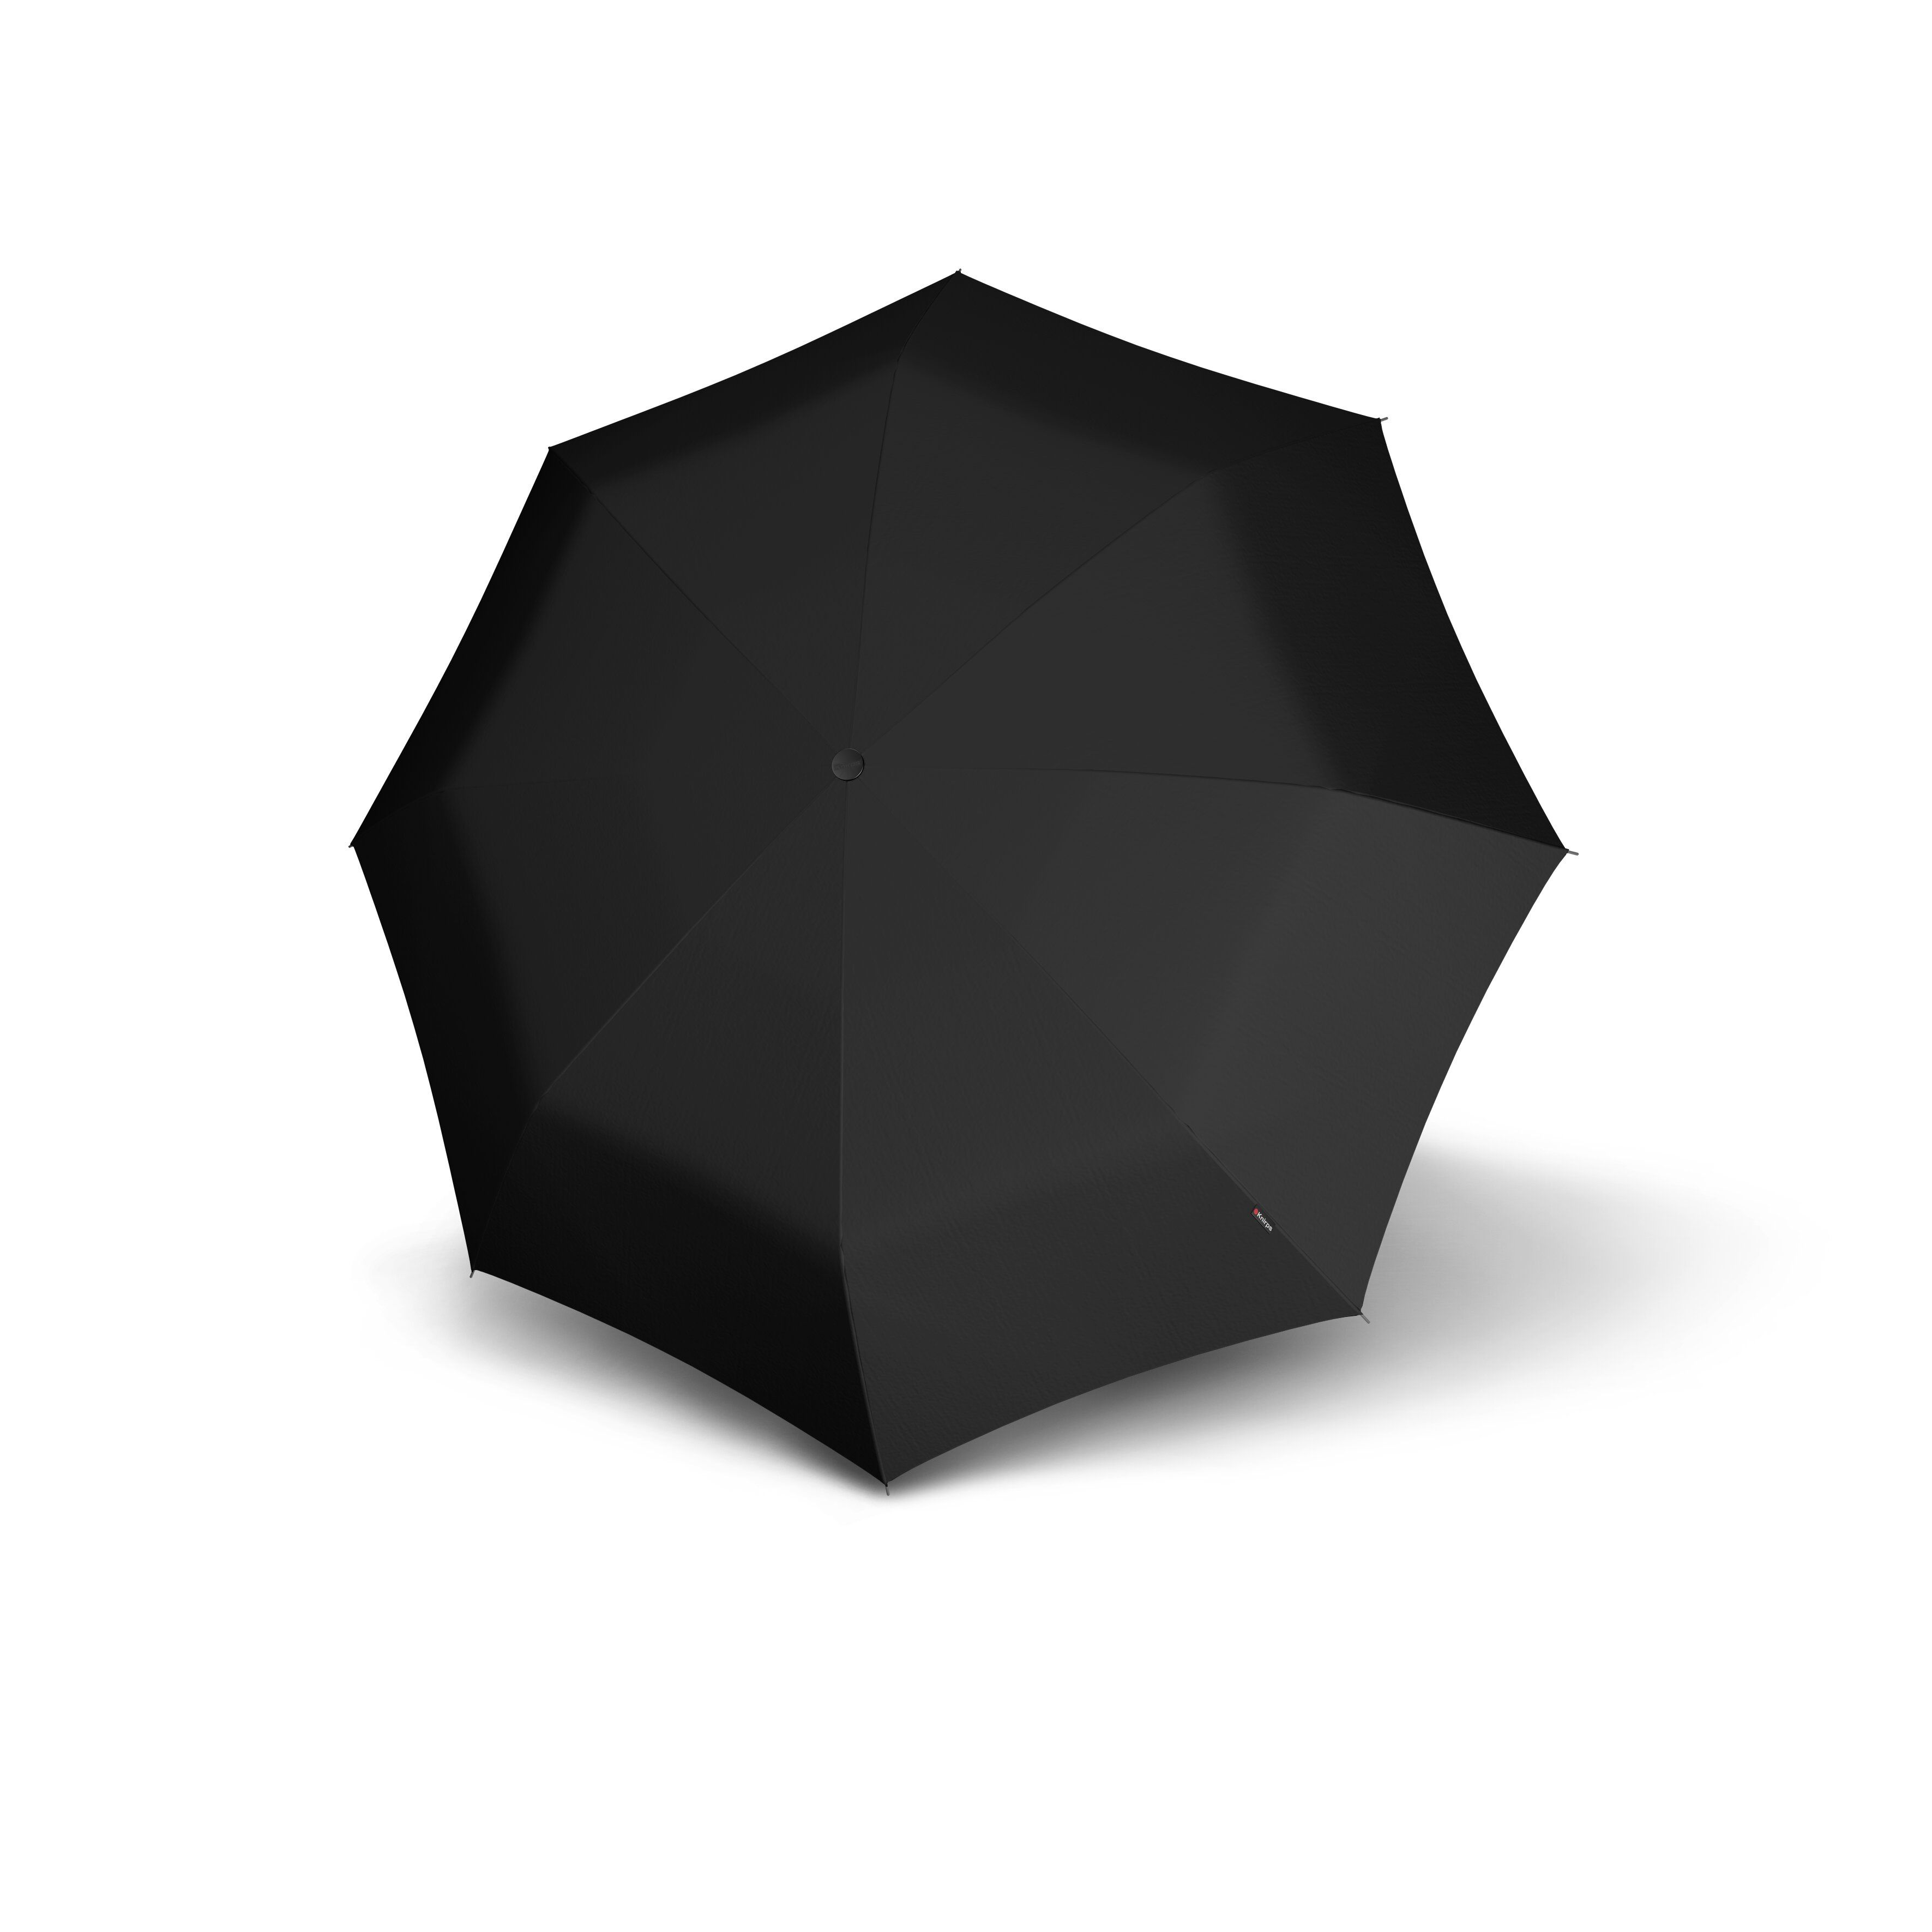 Knirps Umbrella T.903 extra long automatic - foto 2